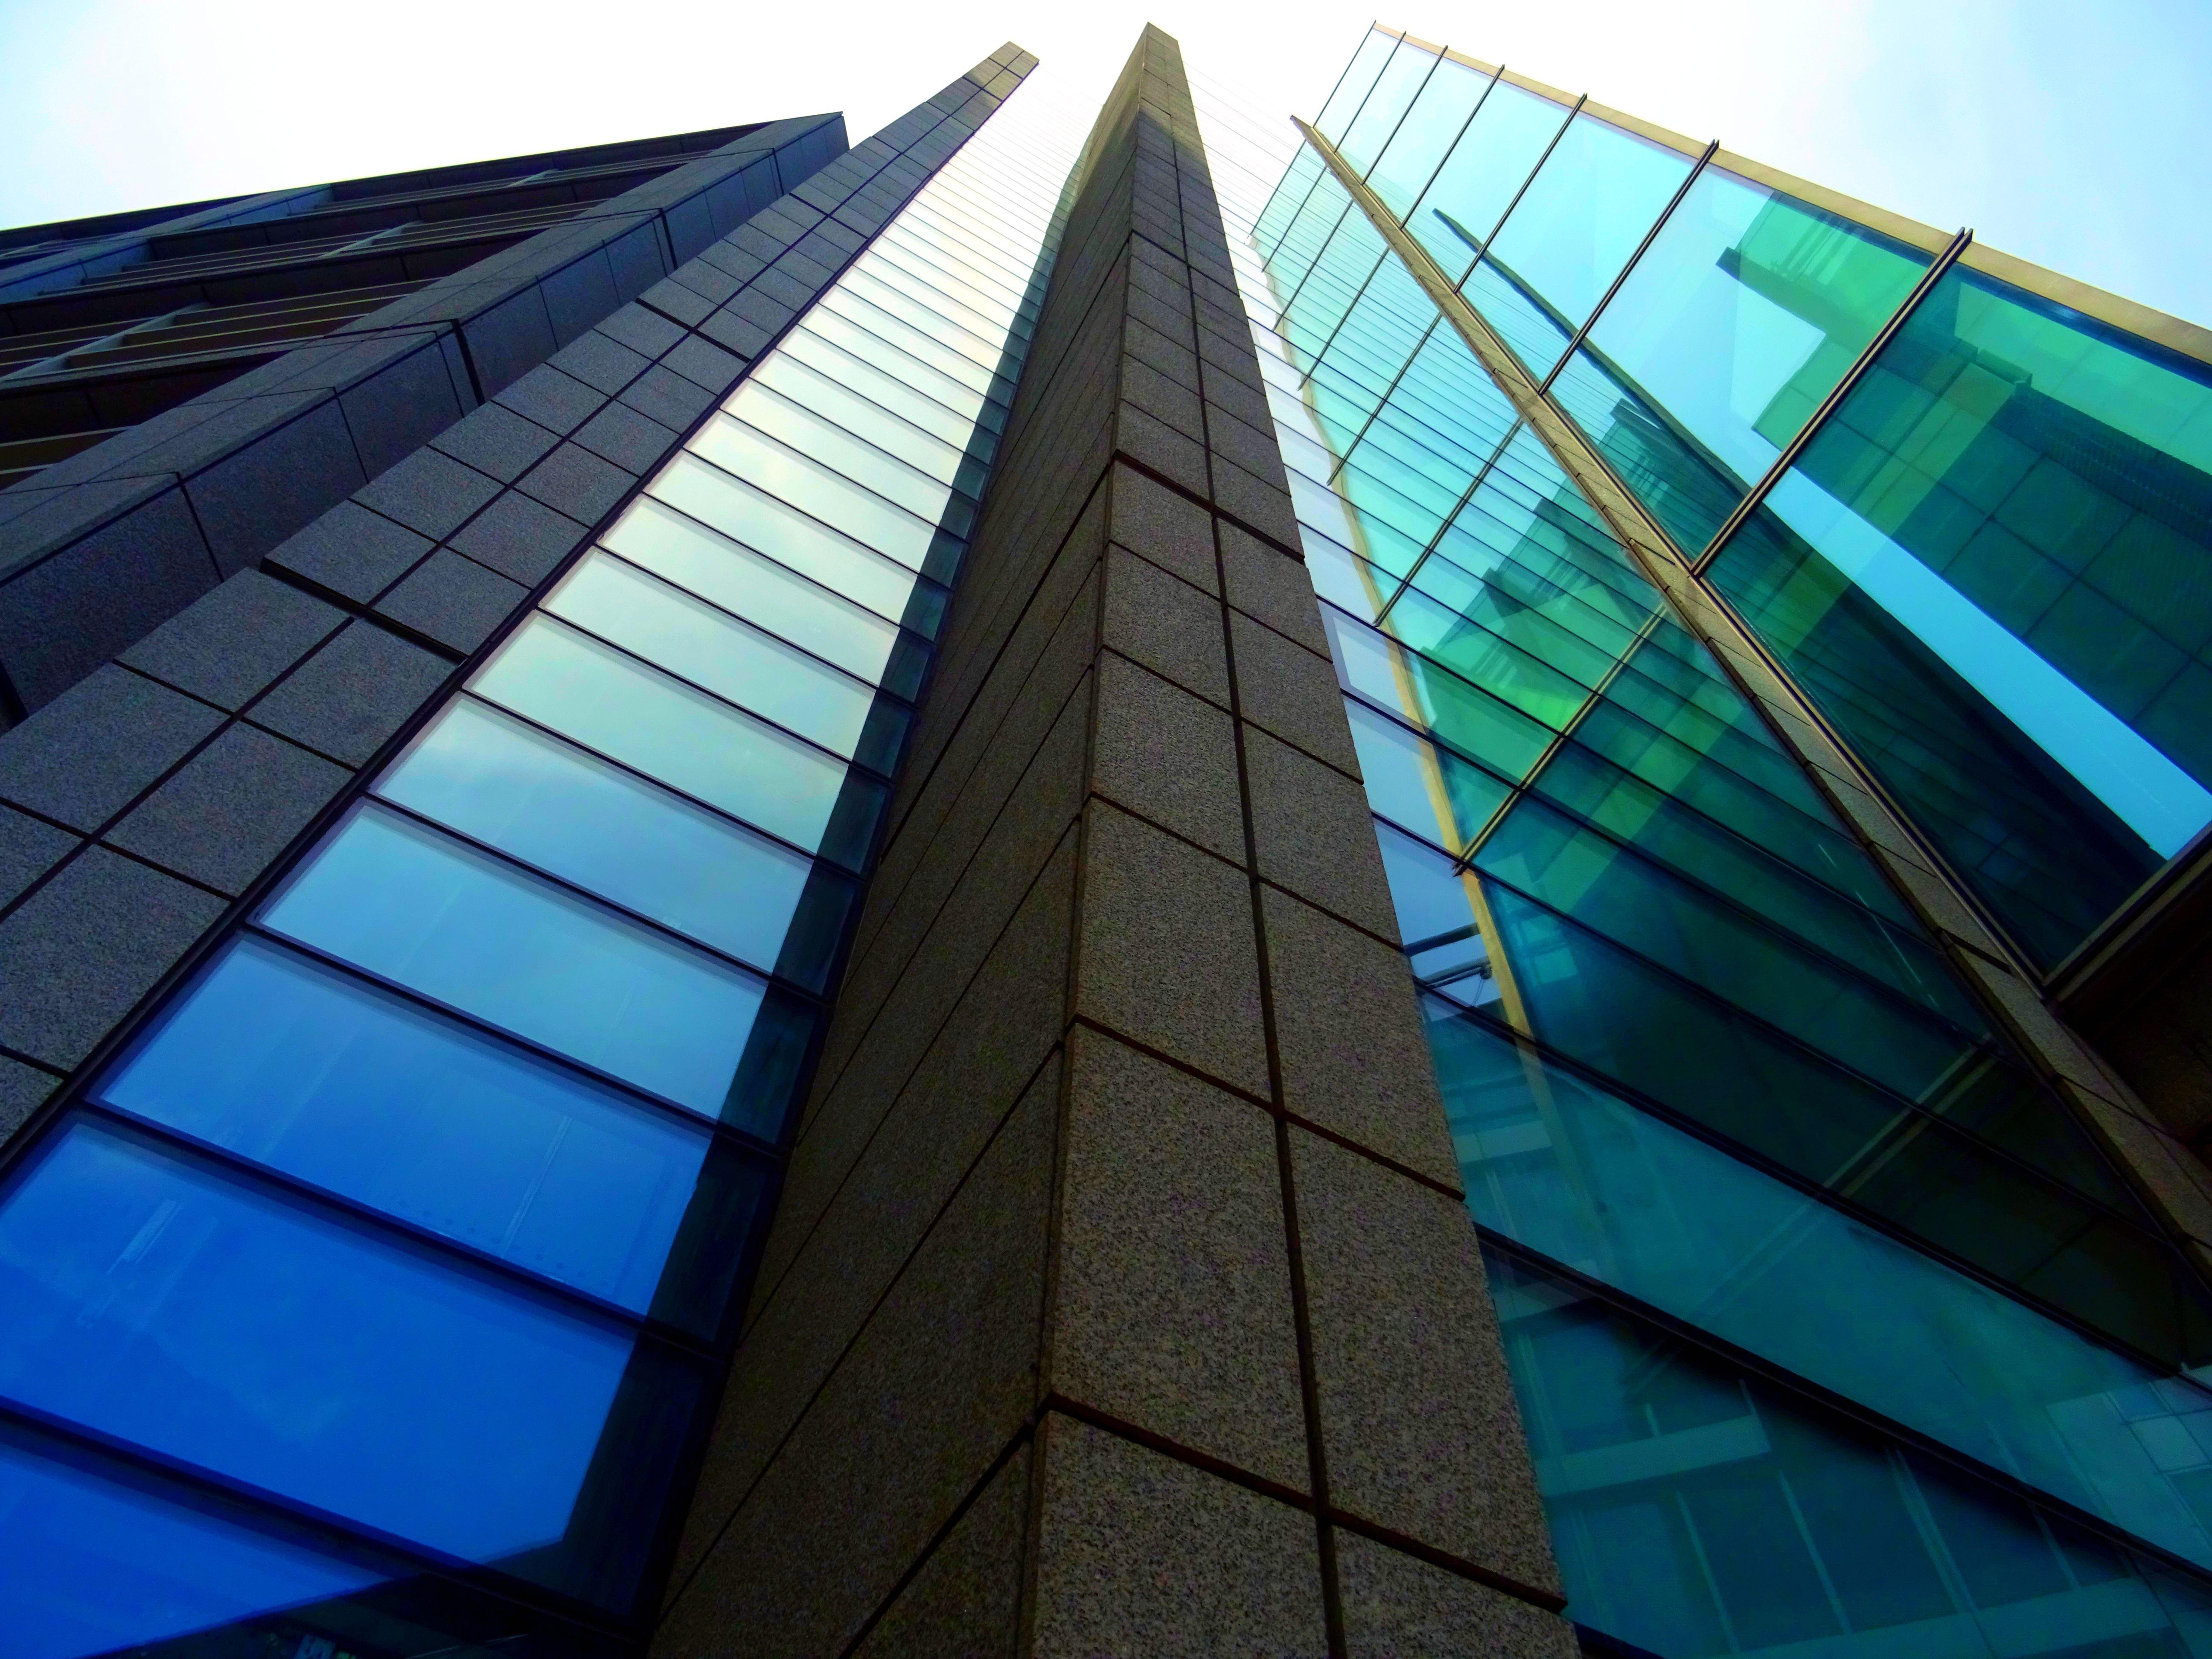 Architectural Design, Architecture, Buildings